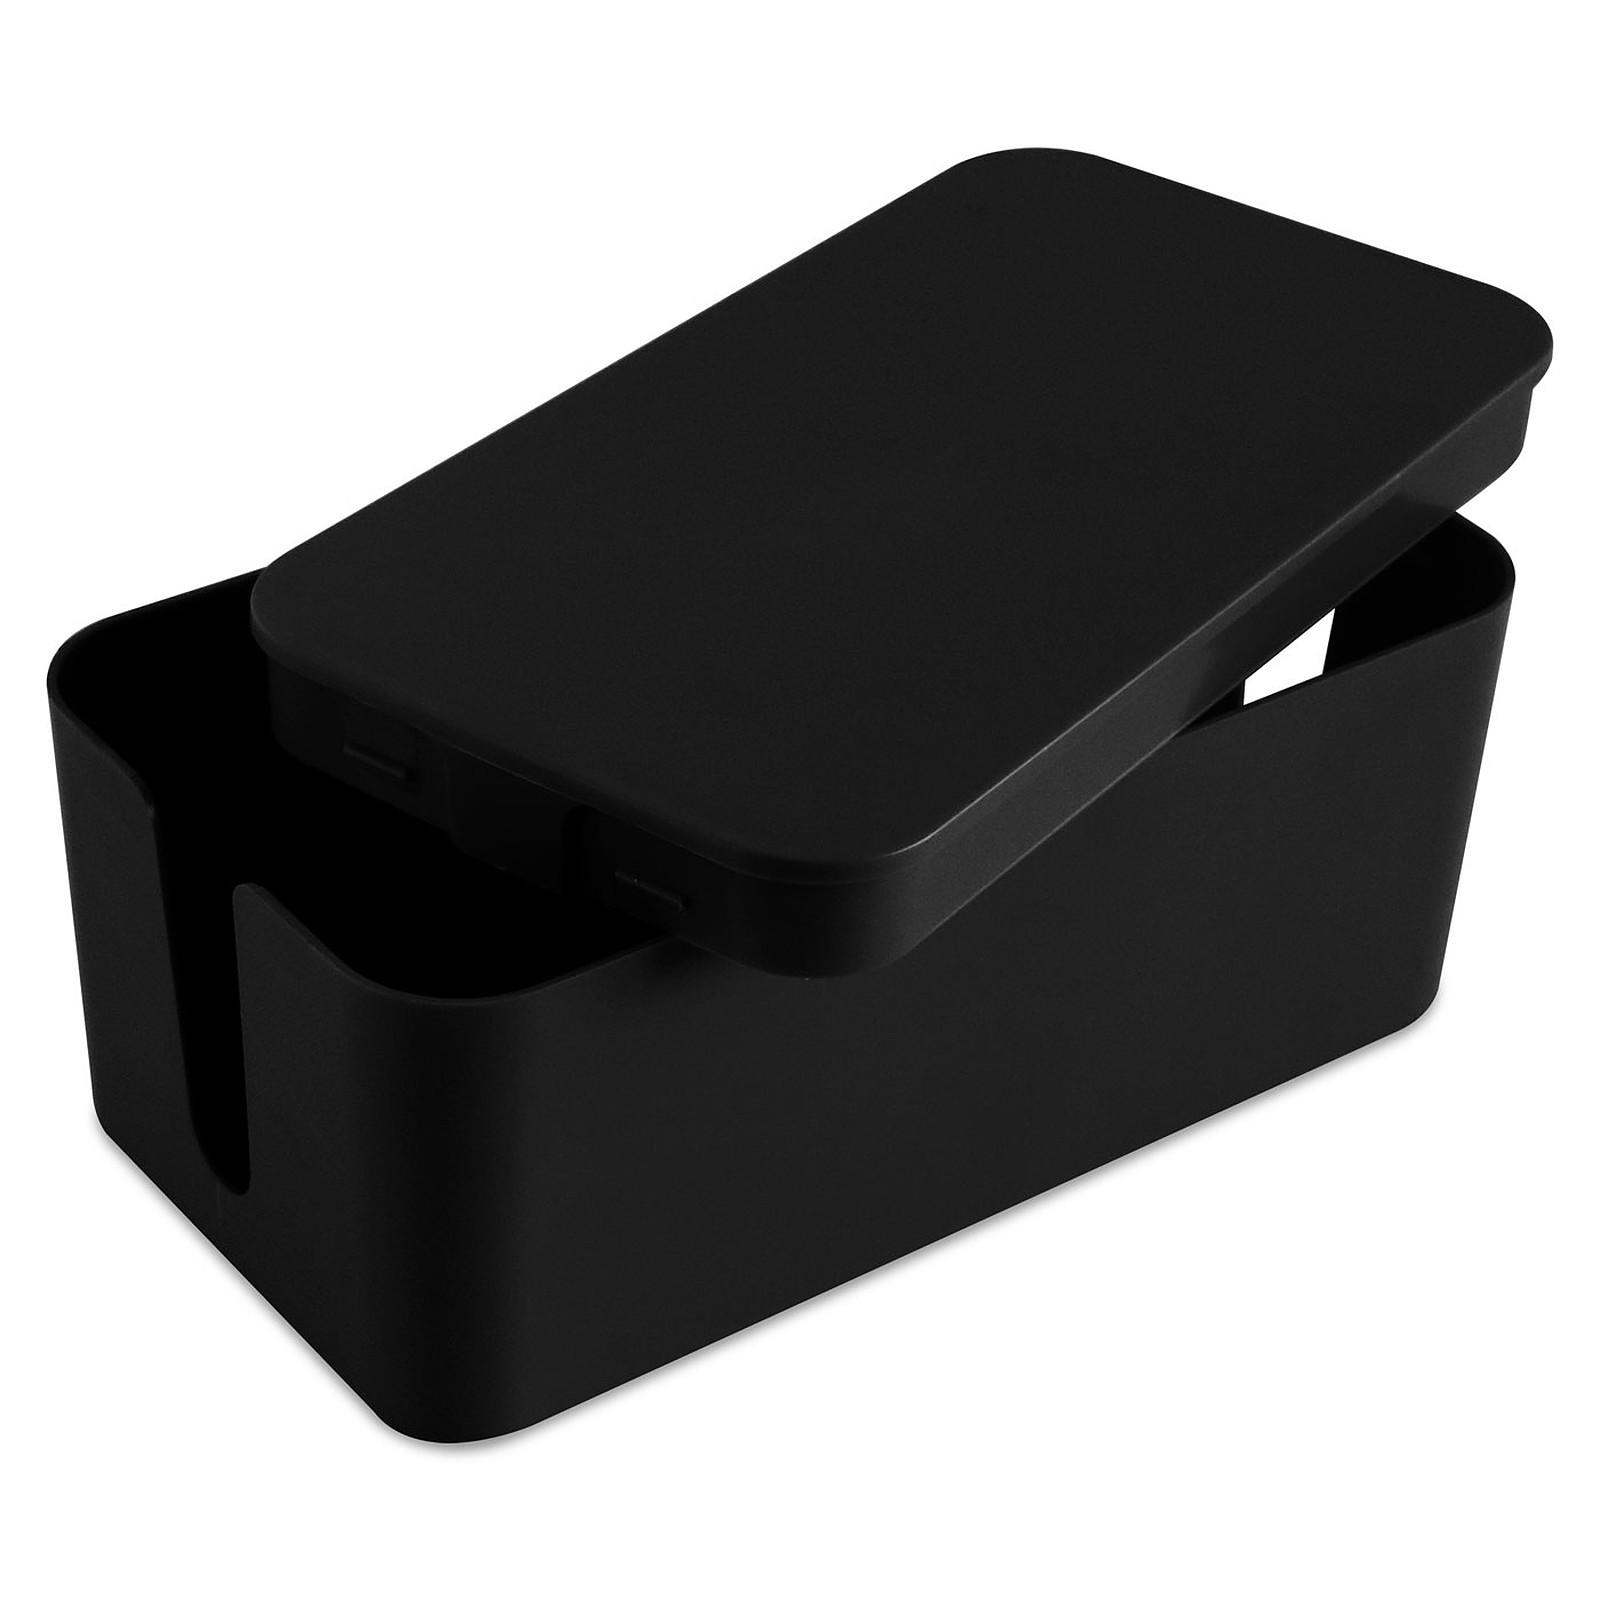 boite cache cable. Black Bedroom Furniture Sets. Home Design Ideas